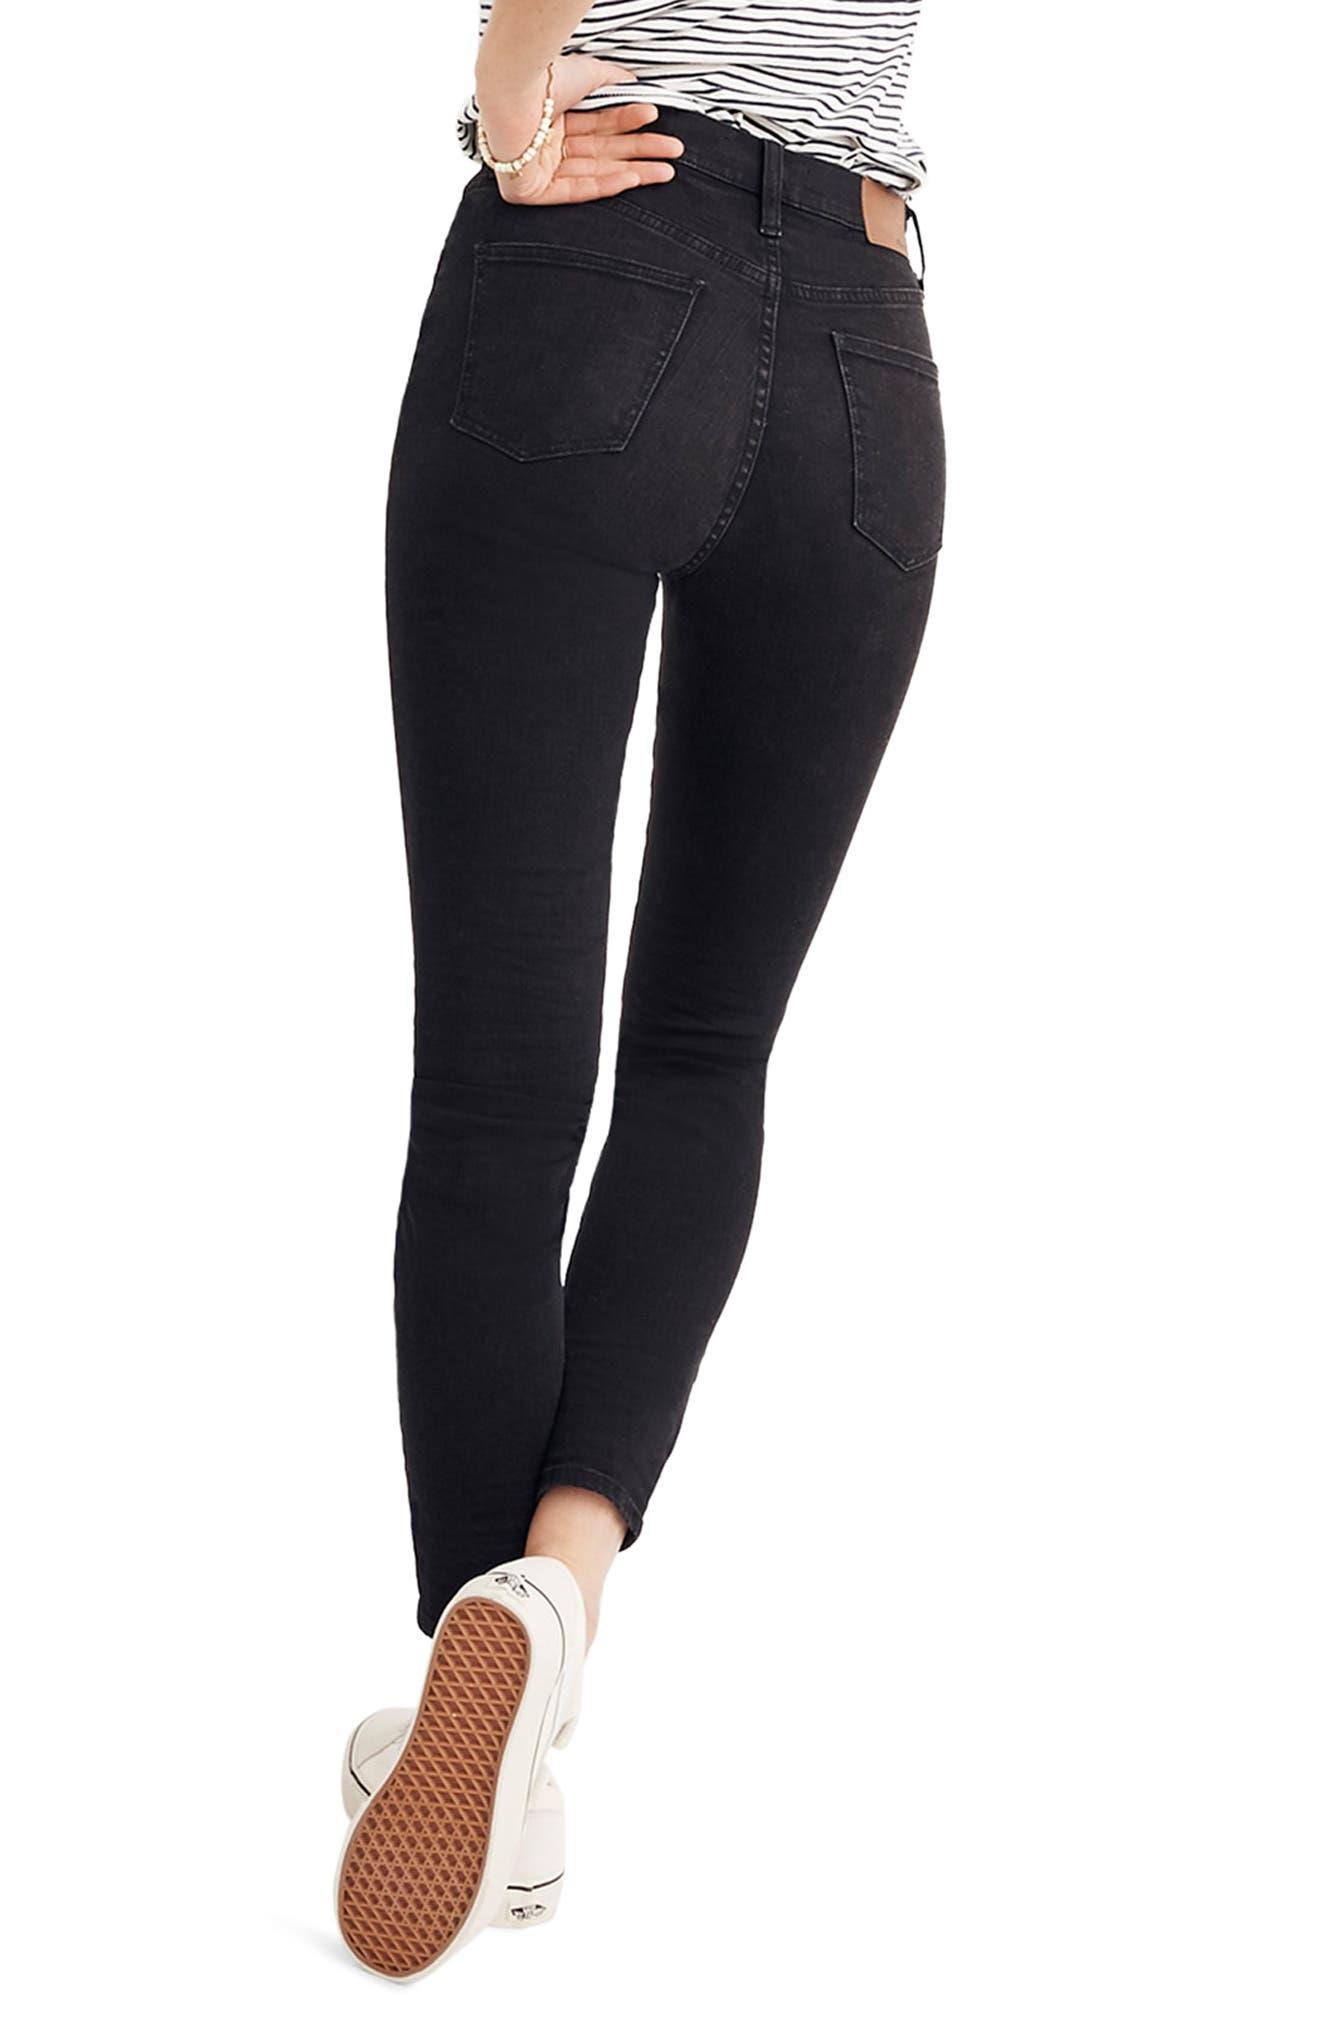 9-Inch High Rise Skinny Jeans,                             Alternate thumbnail 2, color,                             LUNAR